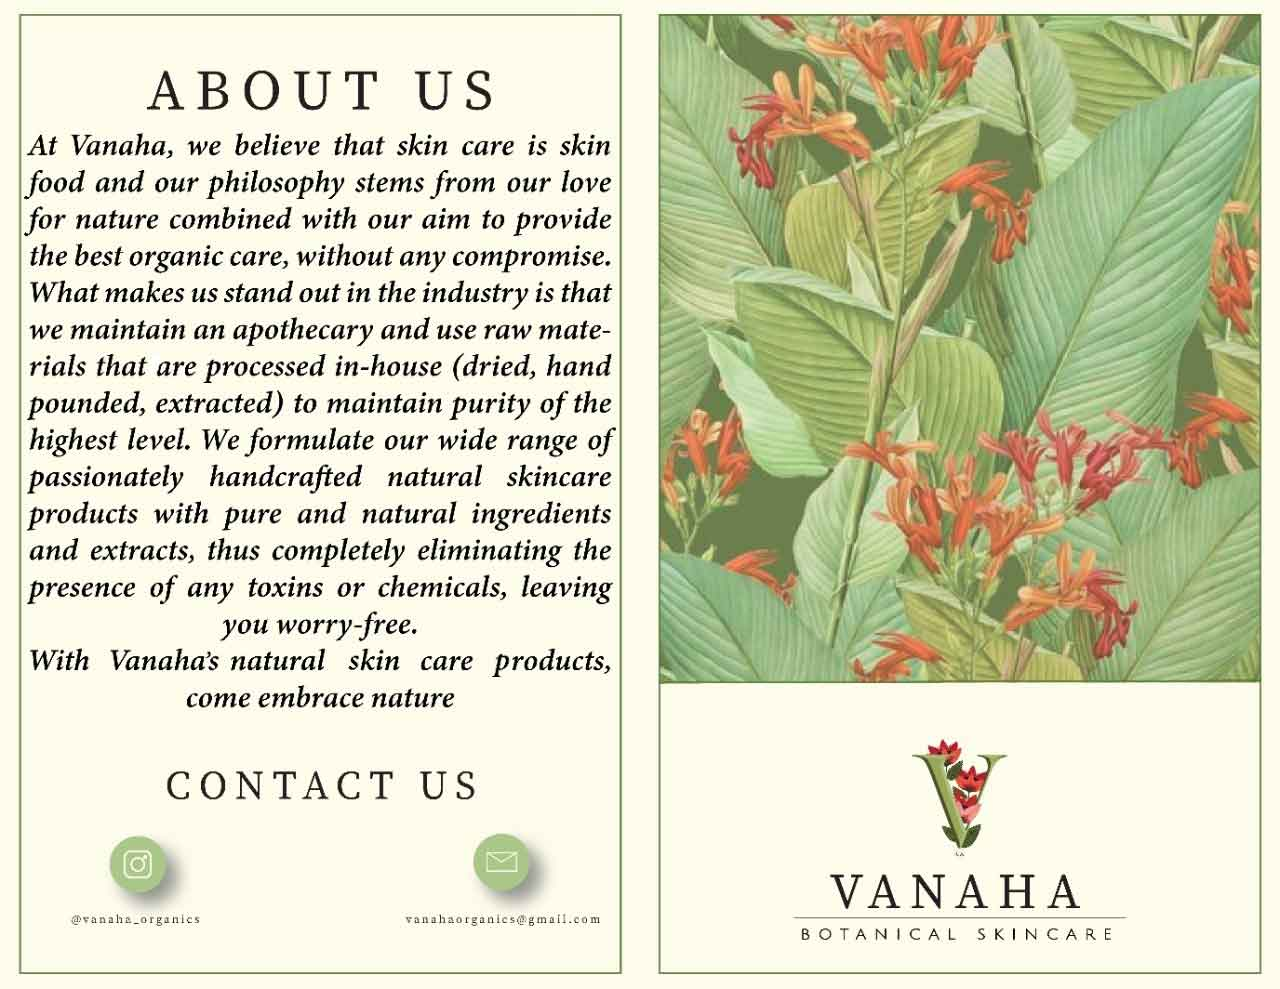 About Vanaha Botanical Skincare Brand